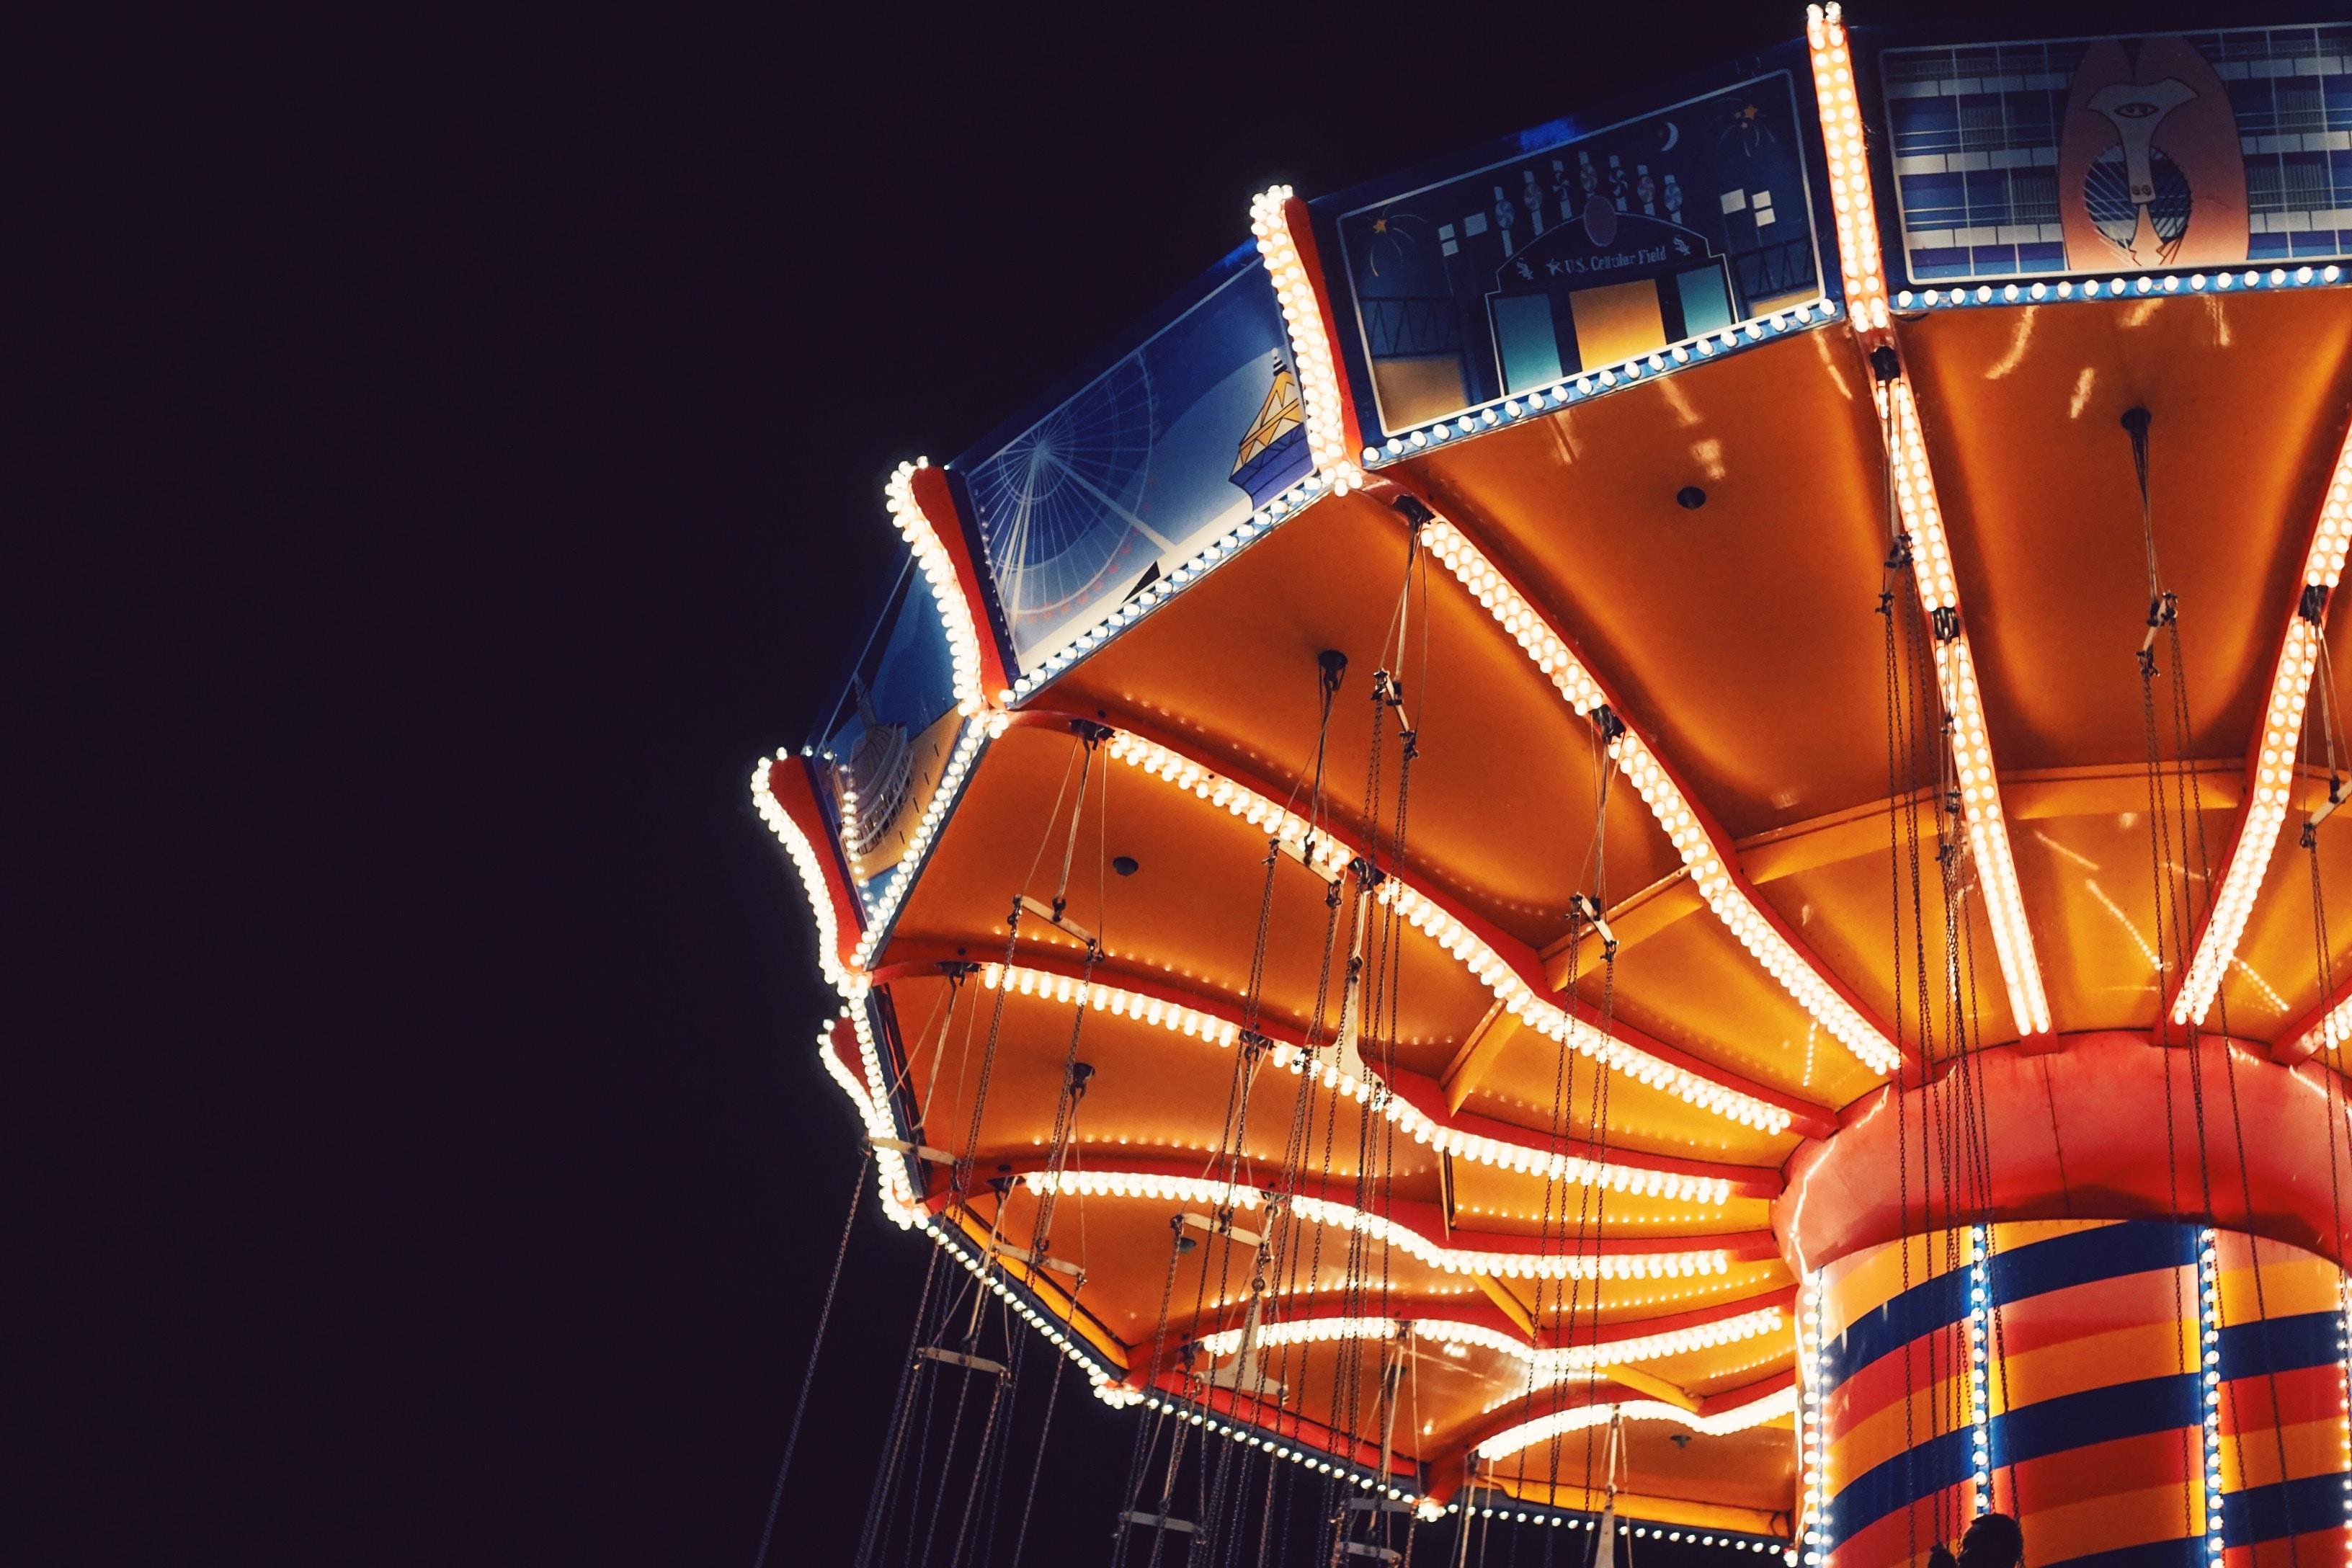 An amusement ride in Navy Pier terminal